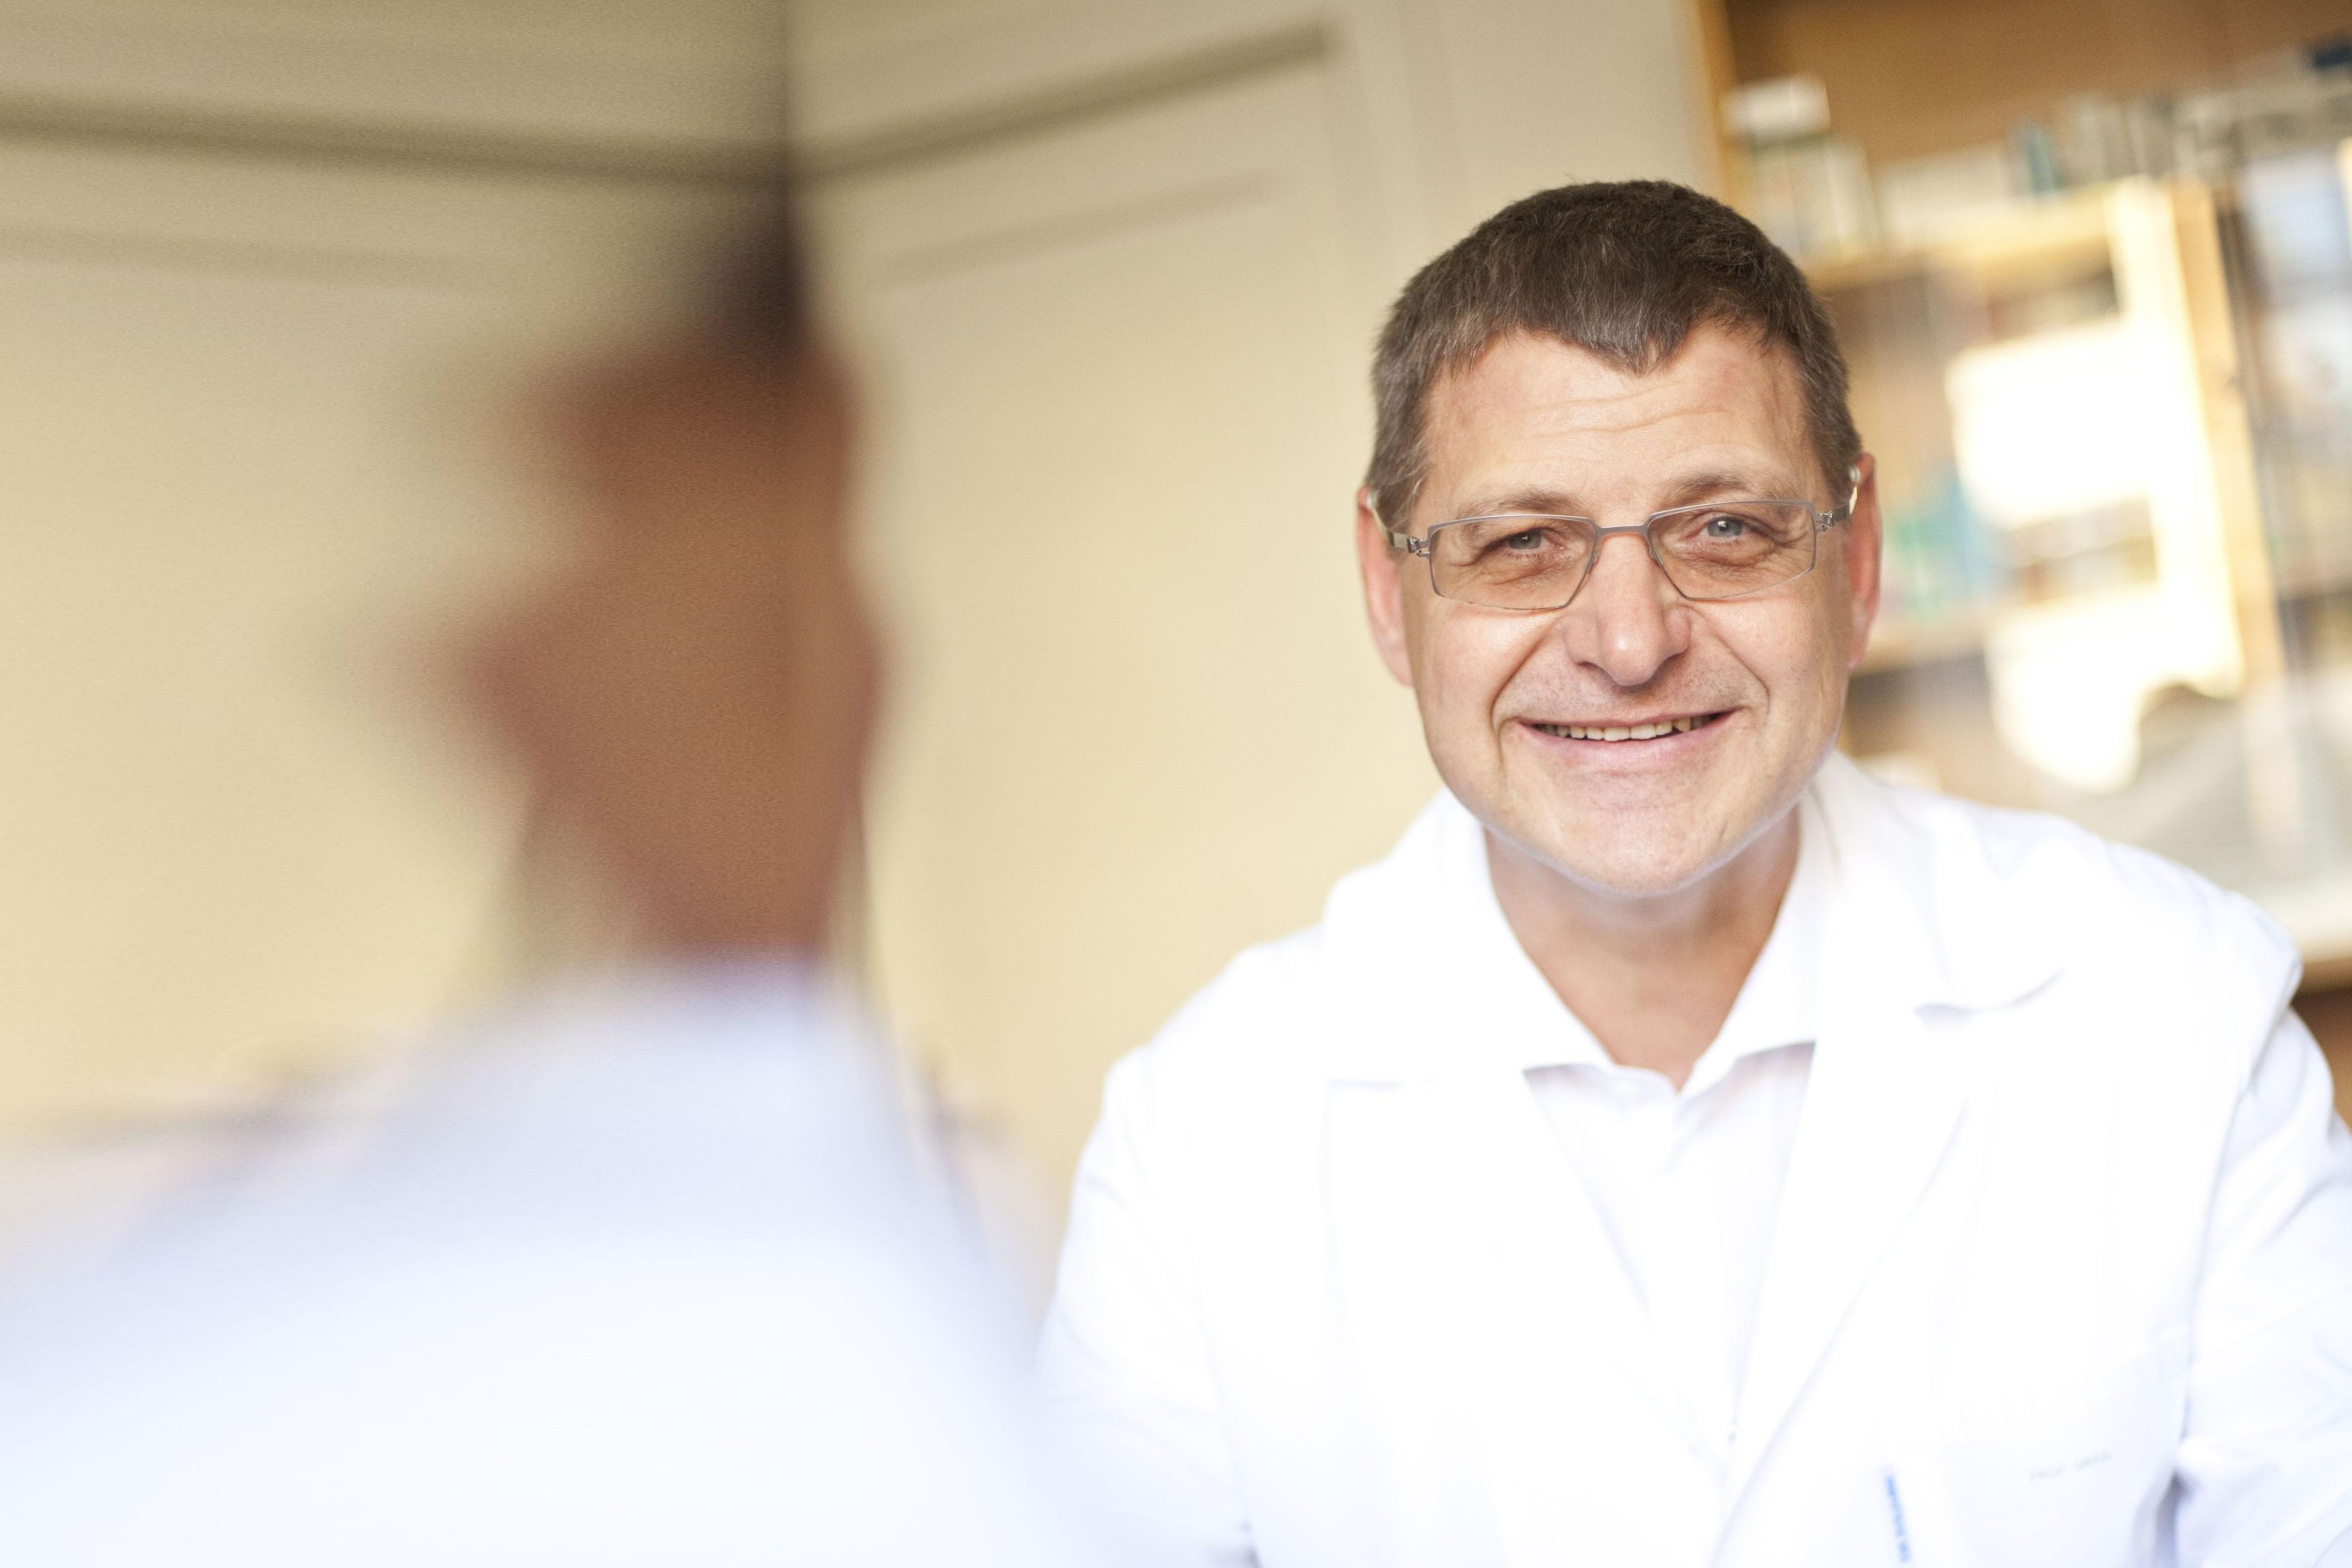 HNO-Arzt